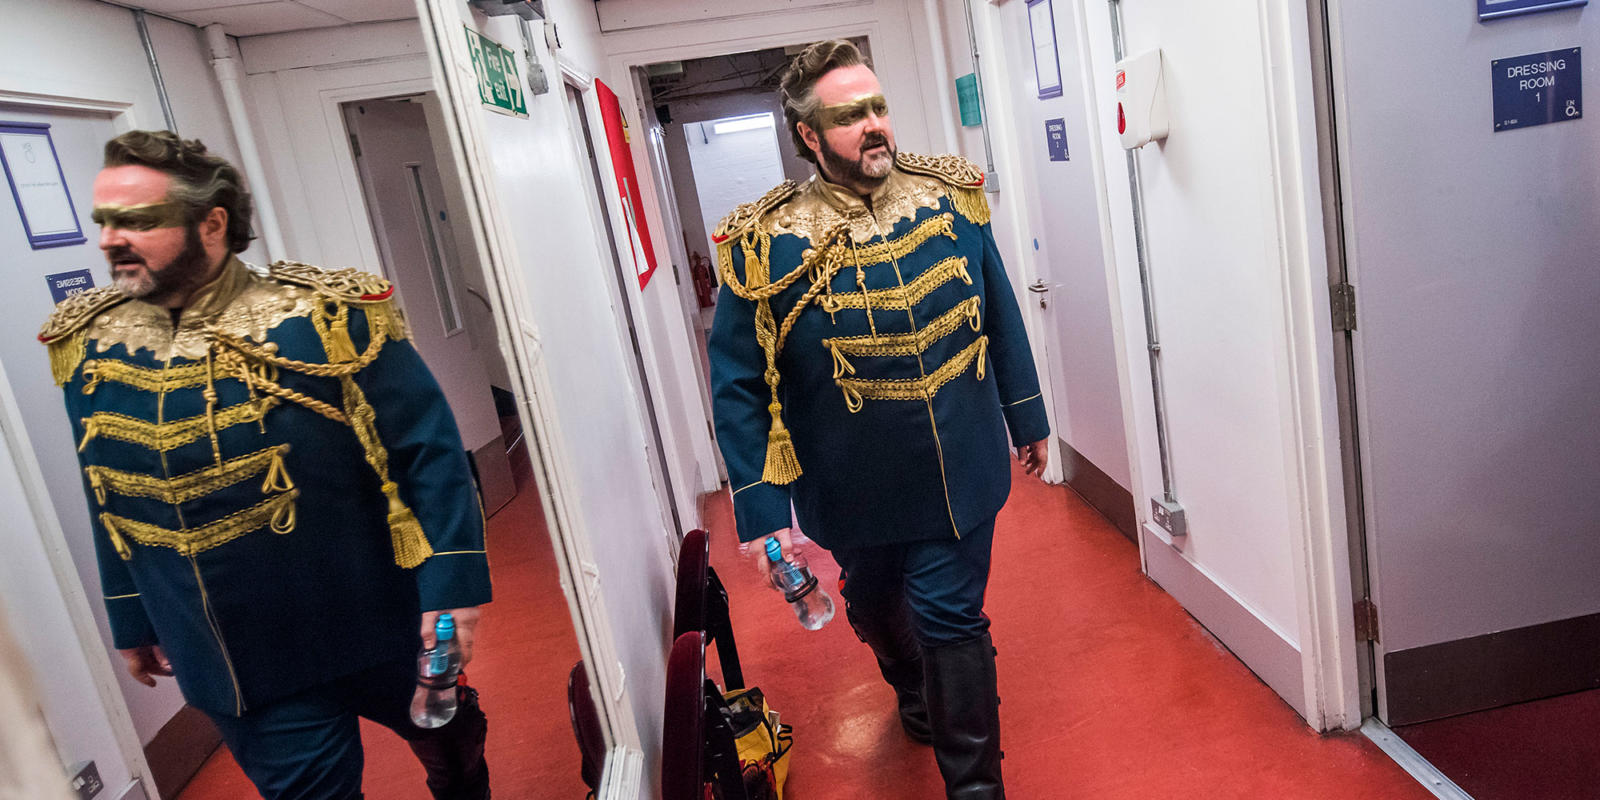 Gwyn Hughes Jones in full costume on his way to sing the role of Radames (c) Tristam Kenton